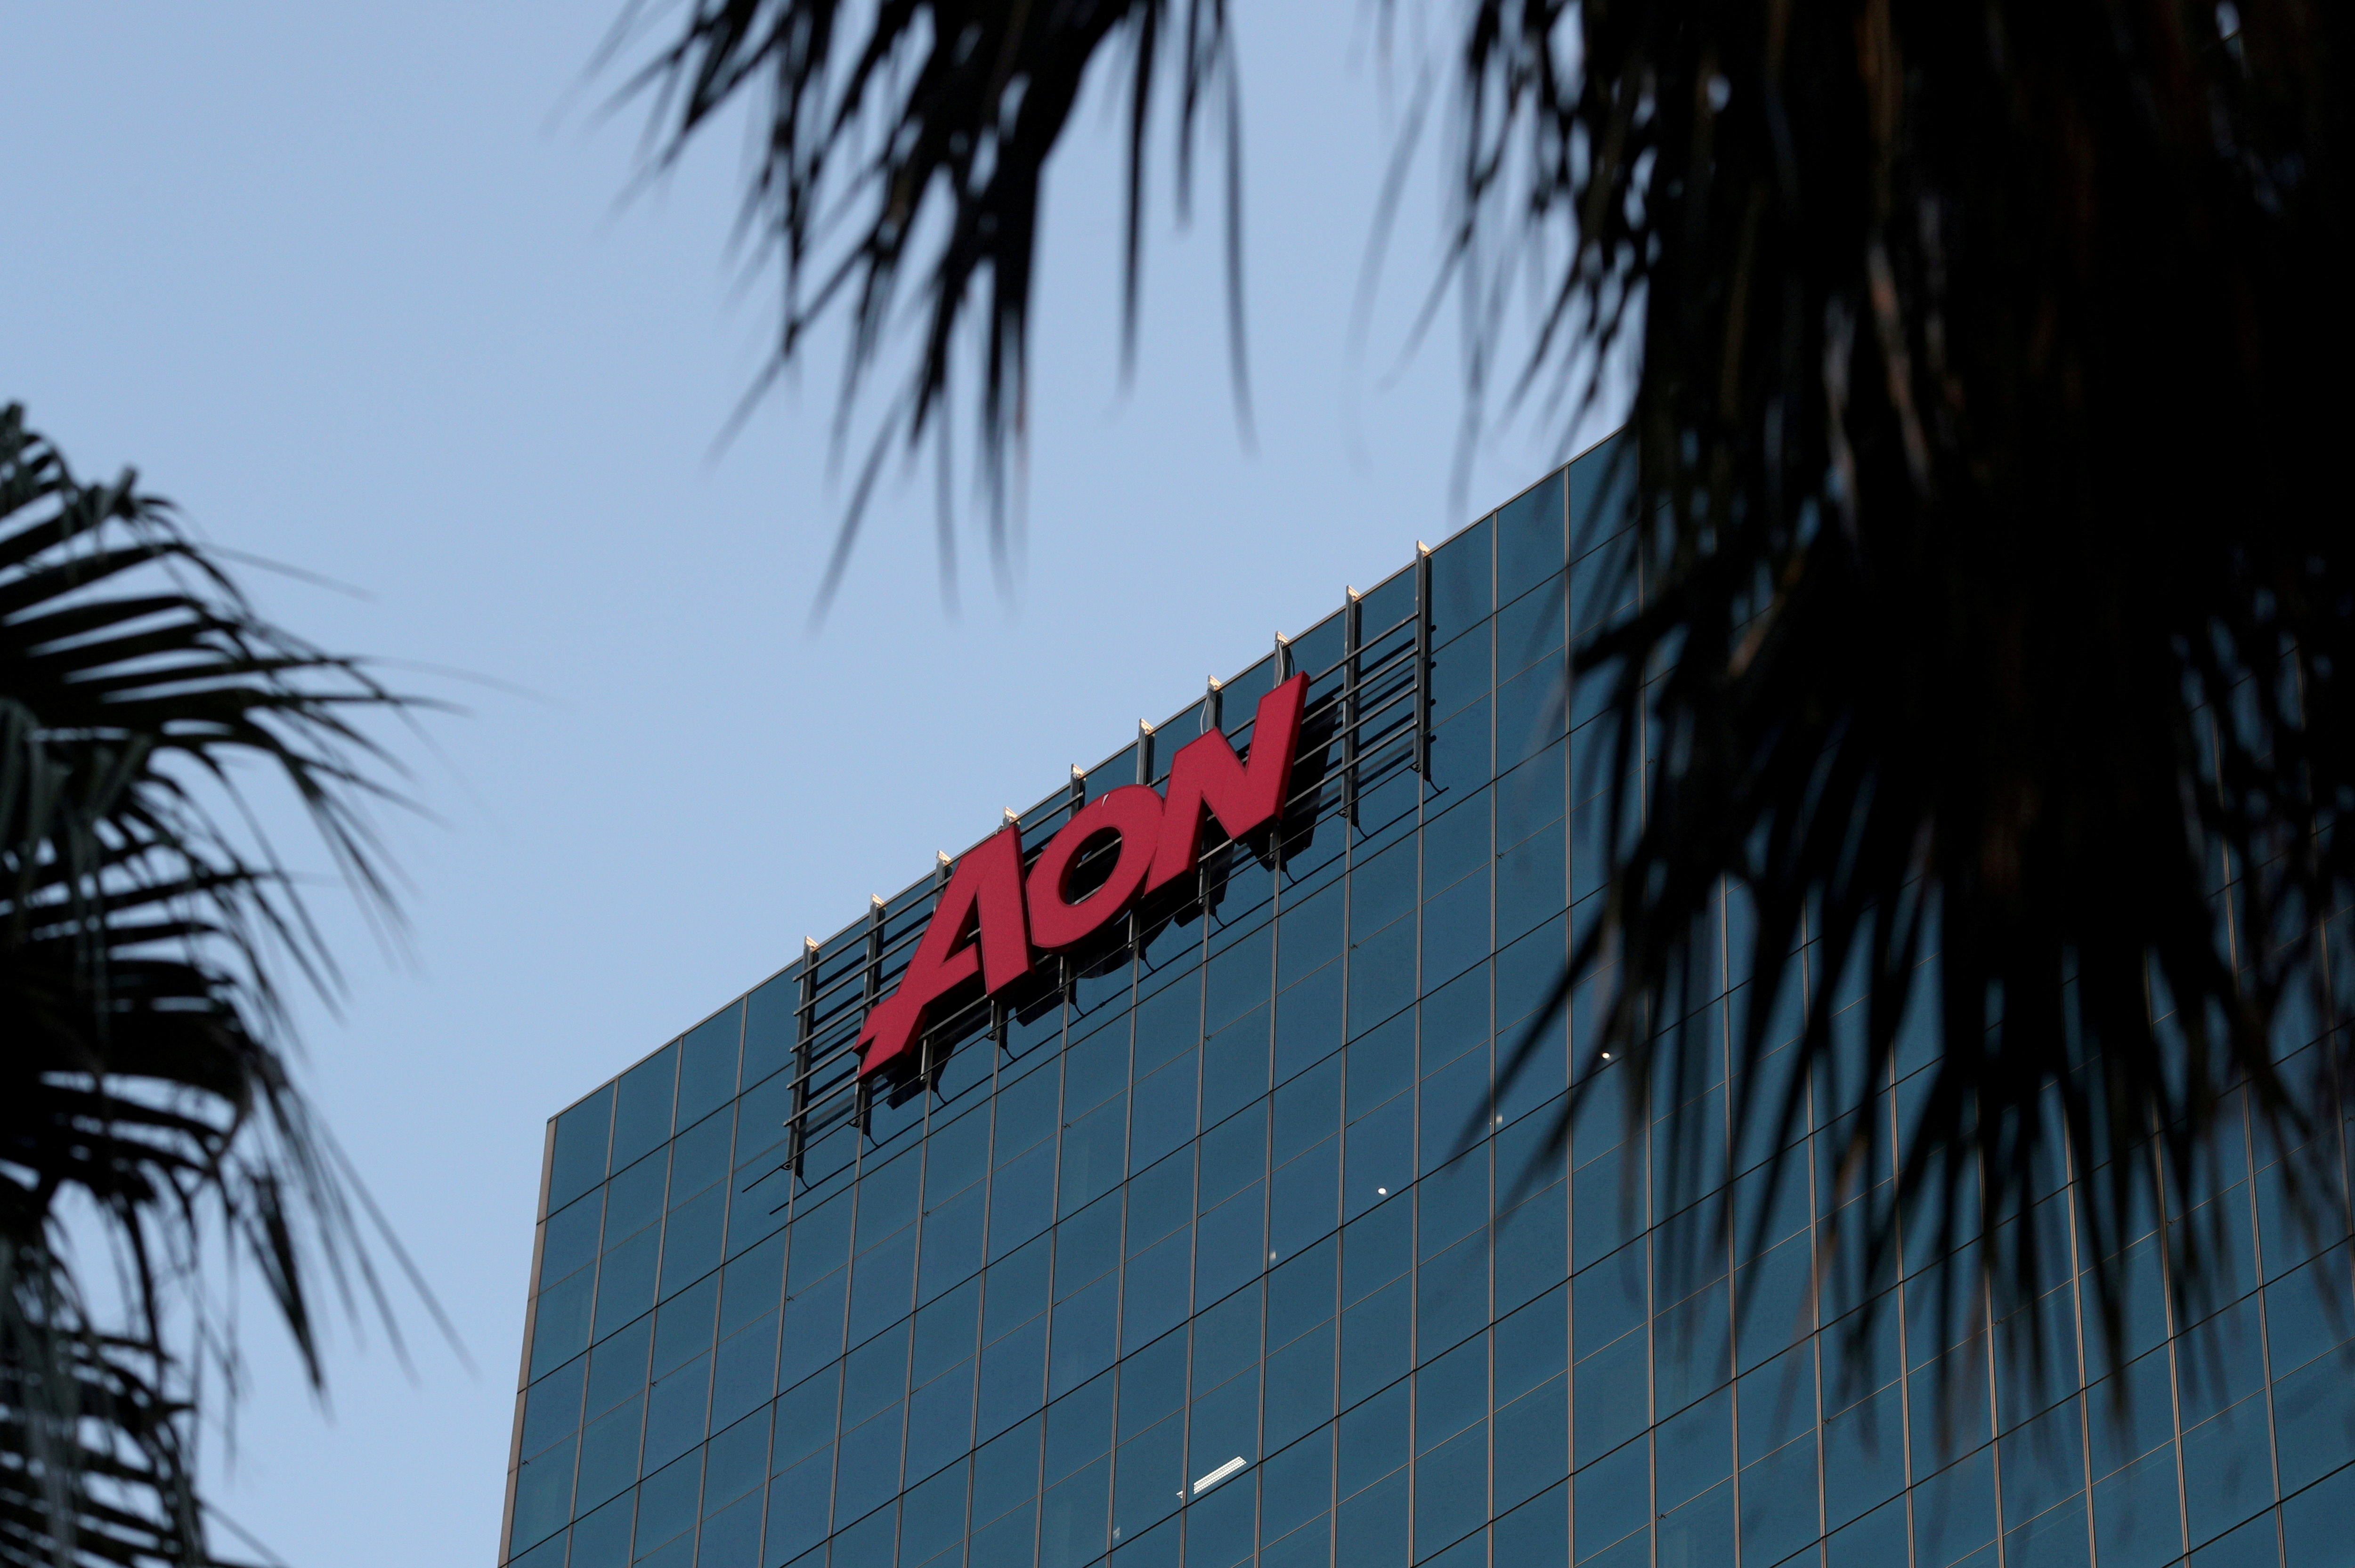 An office building with the Aon logo. June 3, 2020. REUTERS/Loren Elliott